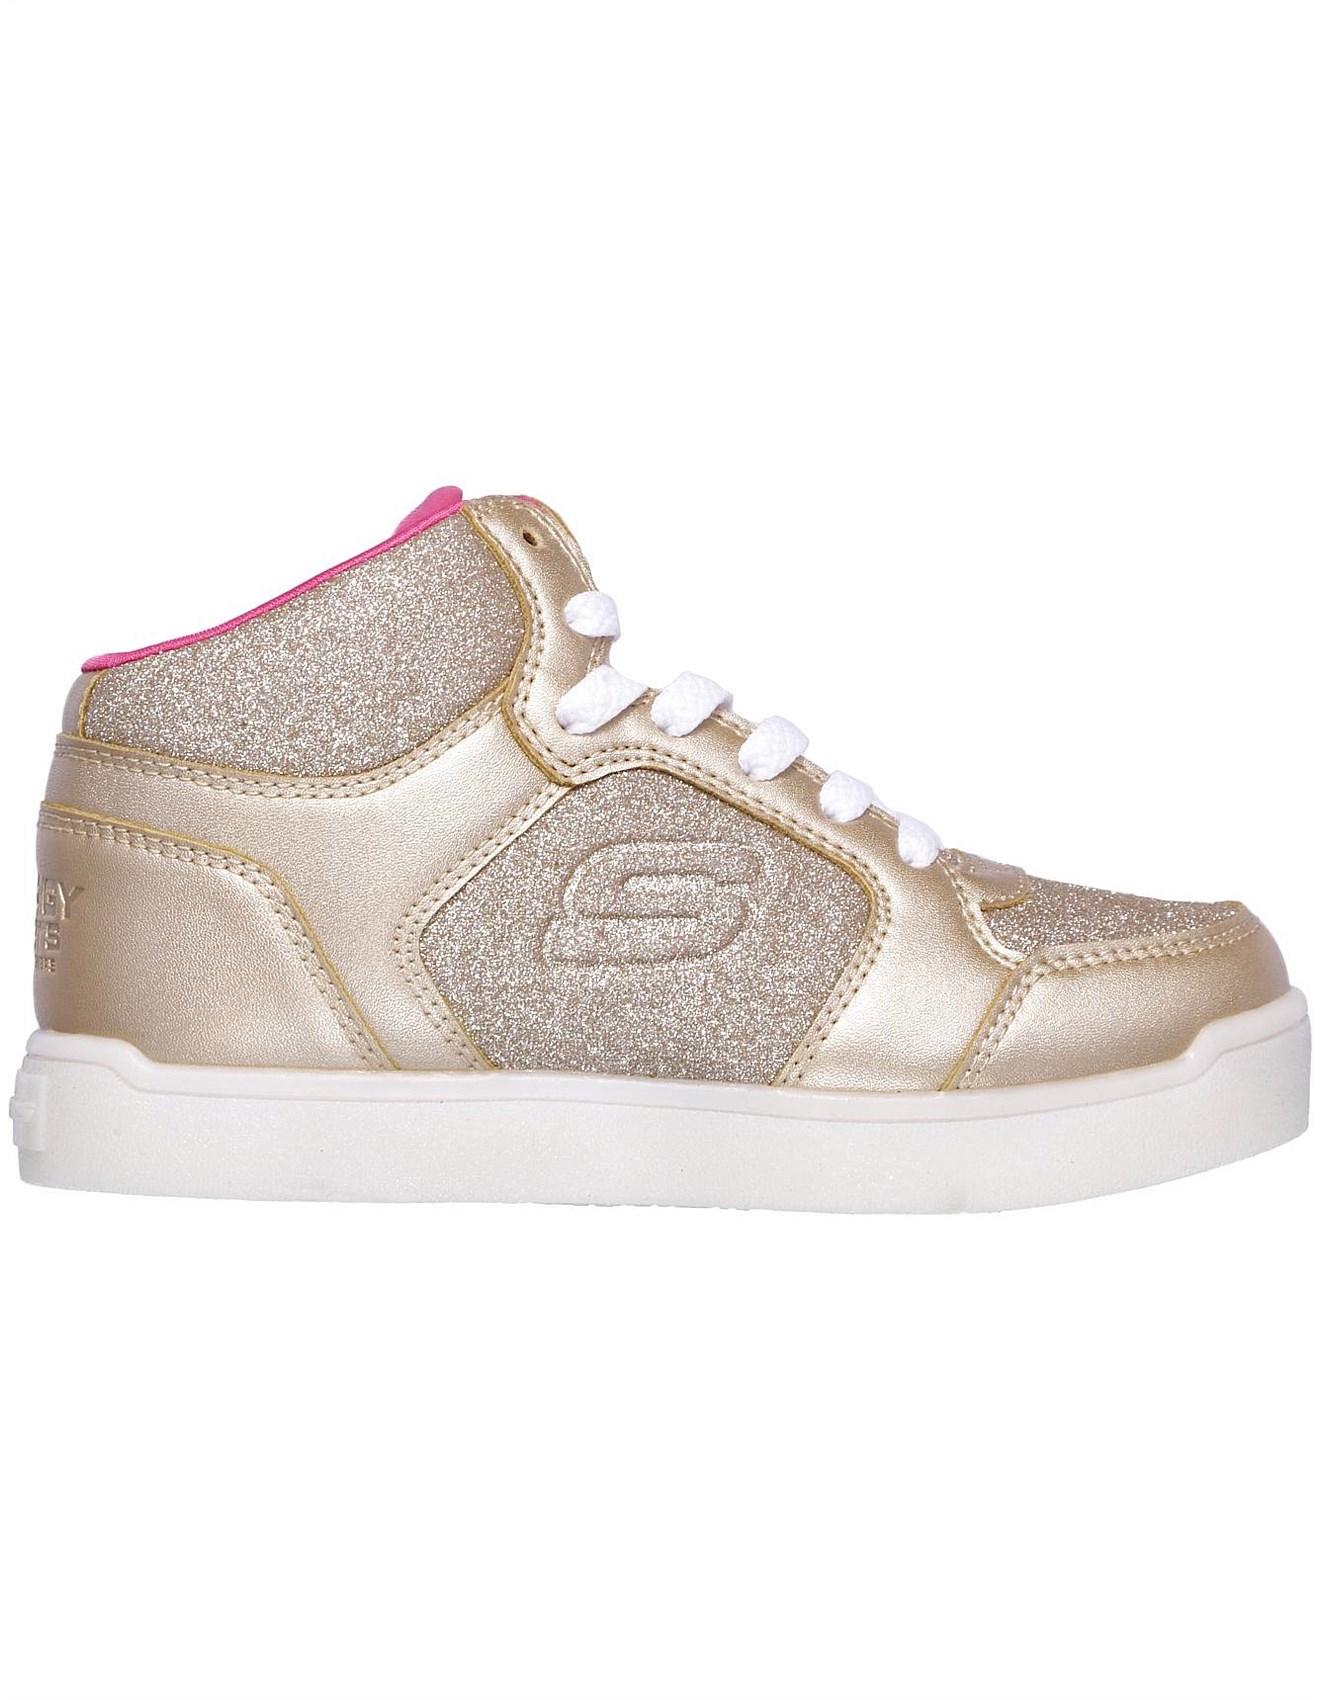 Glitter Glow Liquid Eye Shadow: Girl's Boots, Sneakers & More